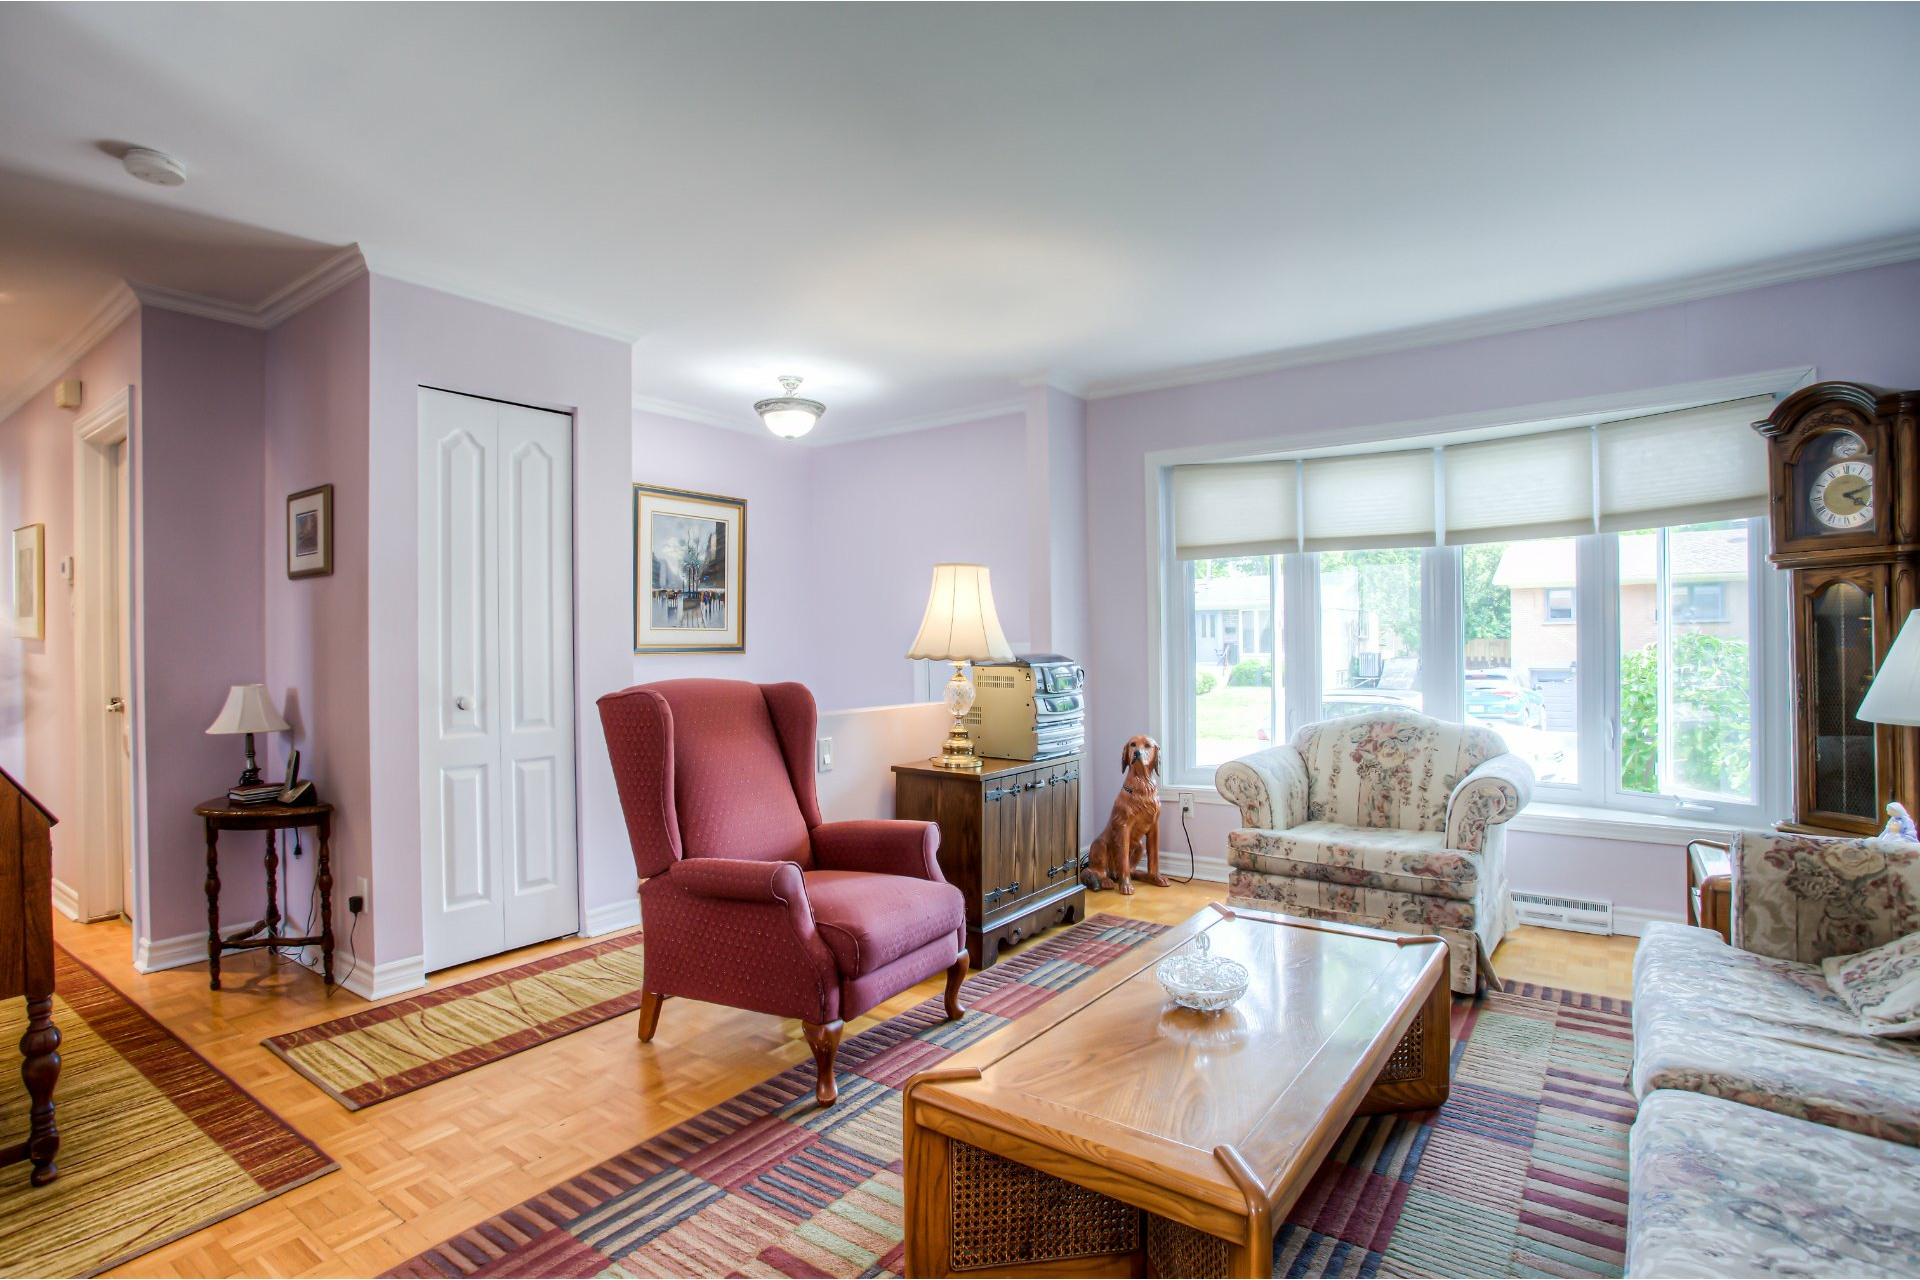 image 2 - House For sale Pierrefonds-Roxboro Montréal  - 10 rooms